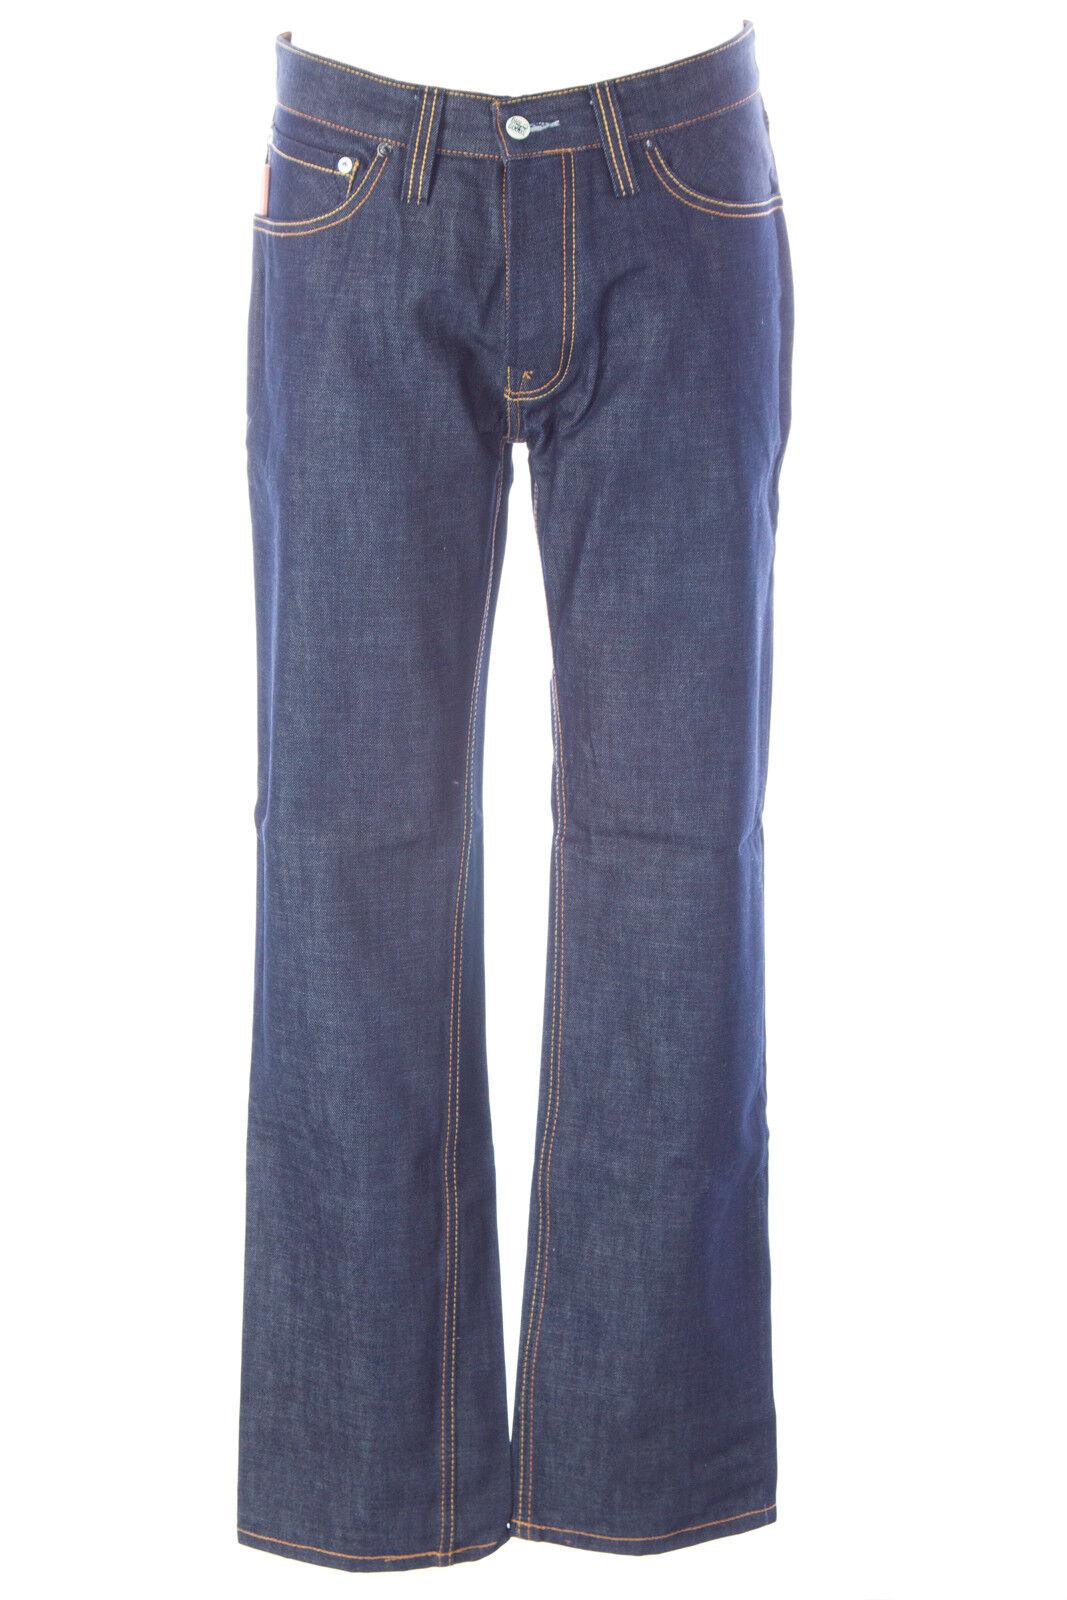 blueE BLOOD Men's Form Dry Cobalt Denim Button Fly Jeans MW07D02 NWT